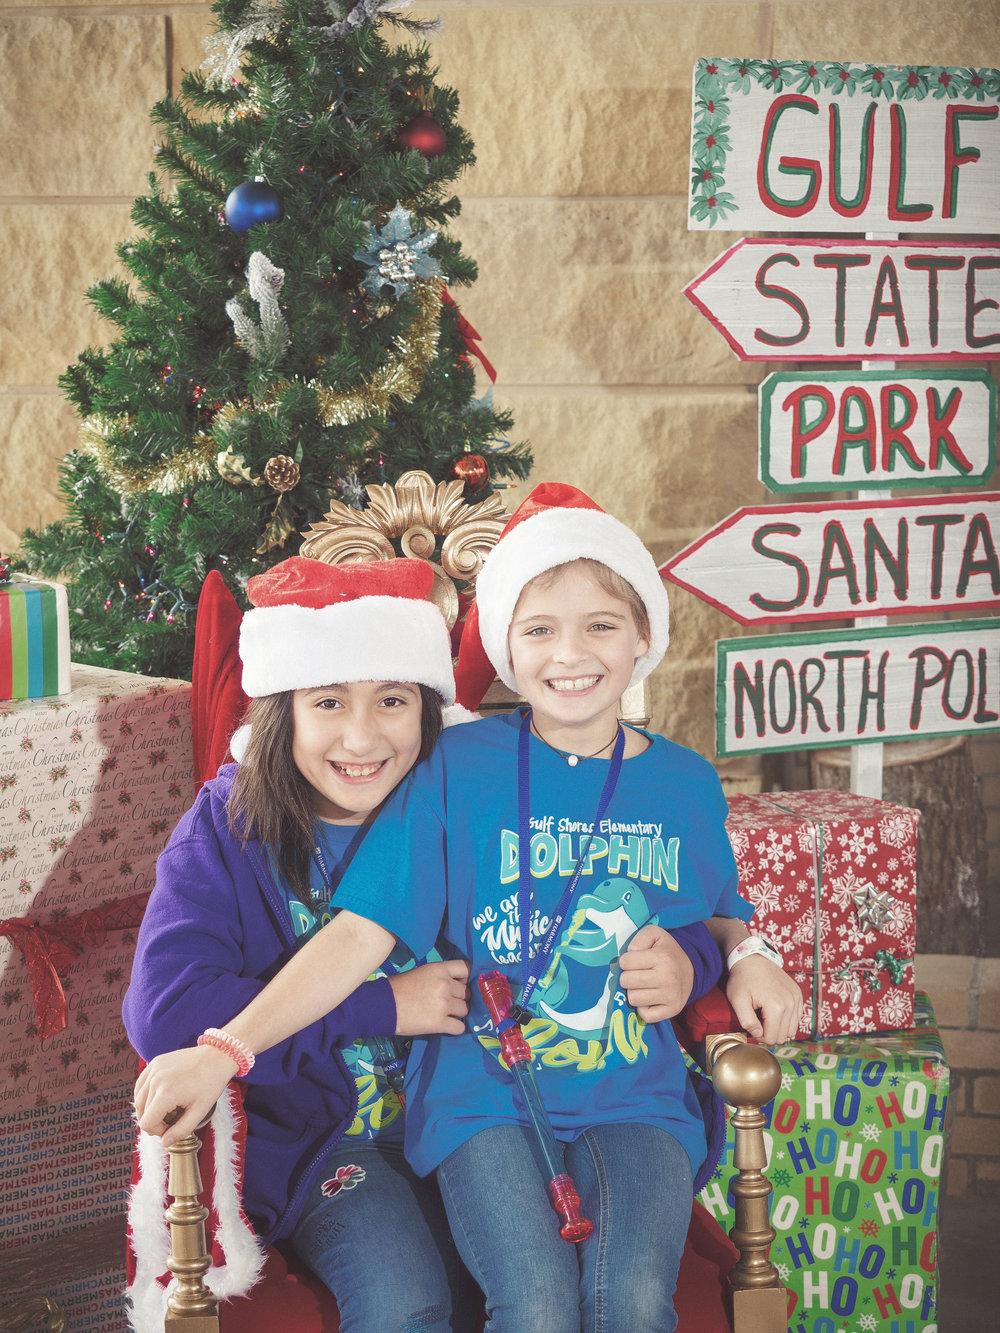 Coastal-Christmas-2017-Gulf-State-Park-Beach-Pavilion-001